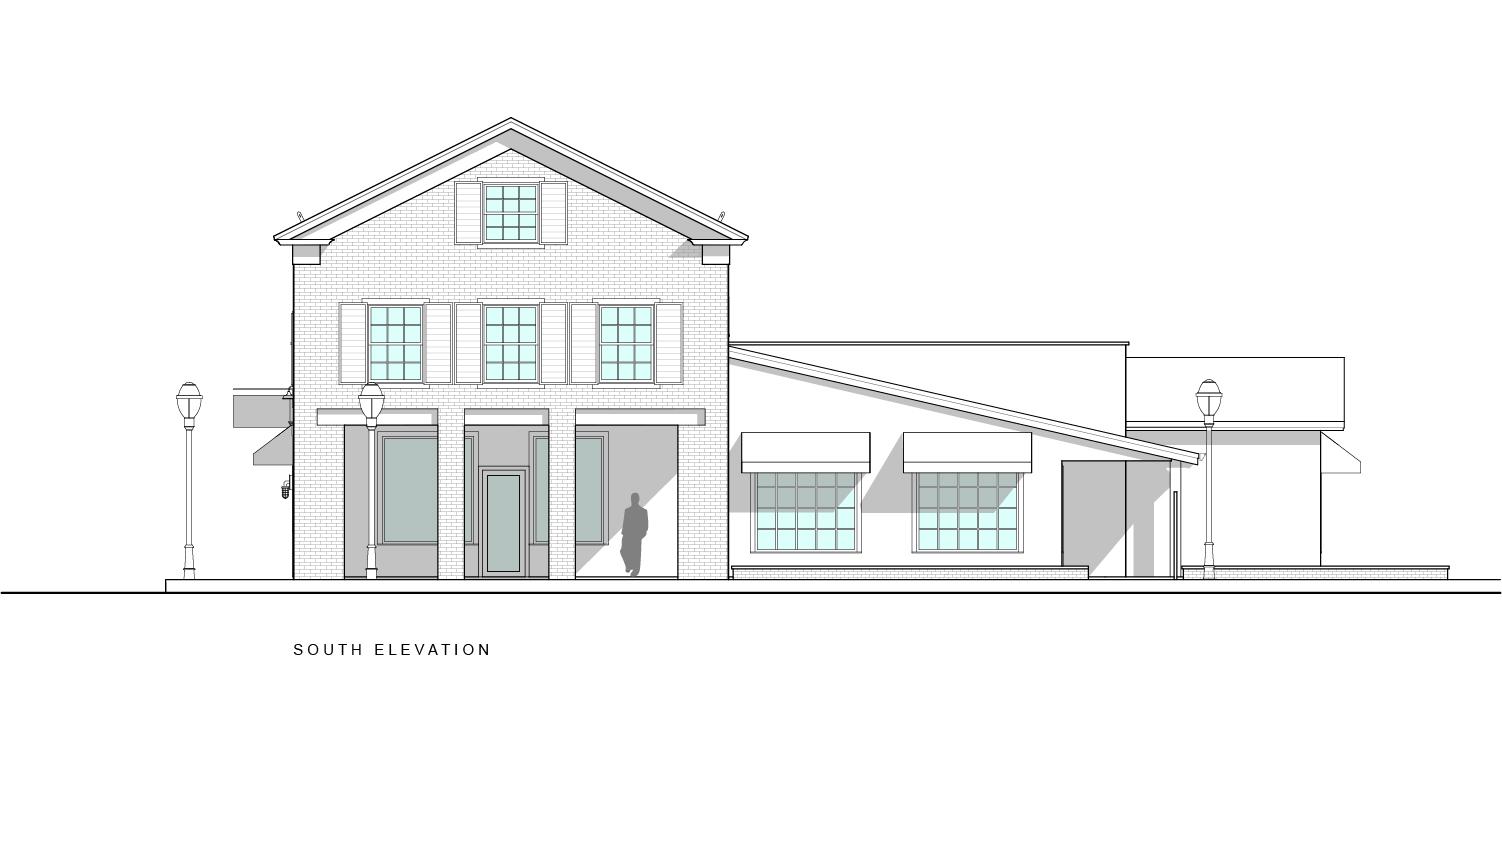 brooks-building-south-elevation